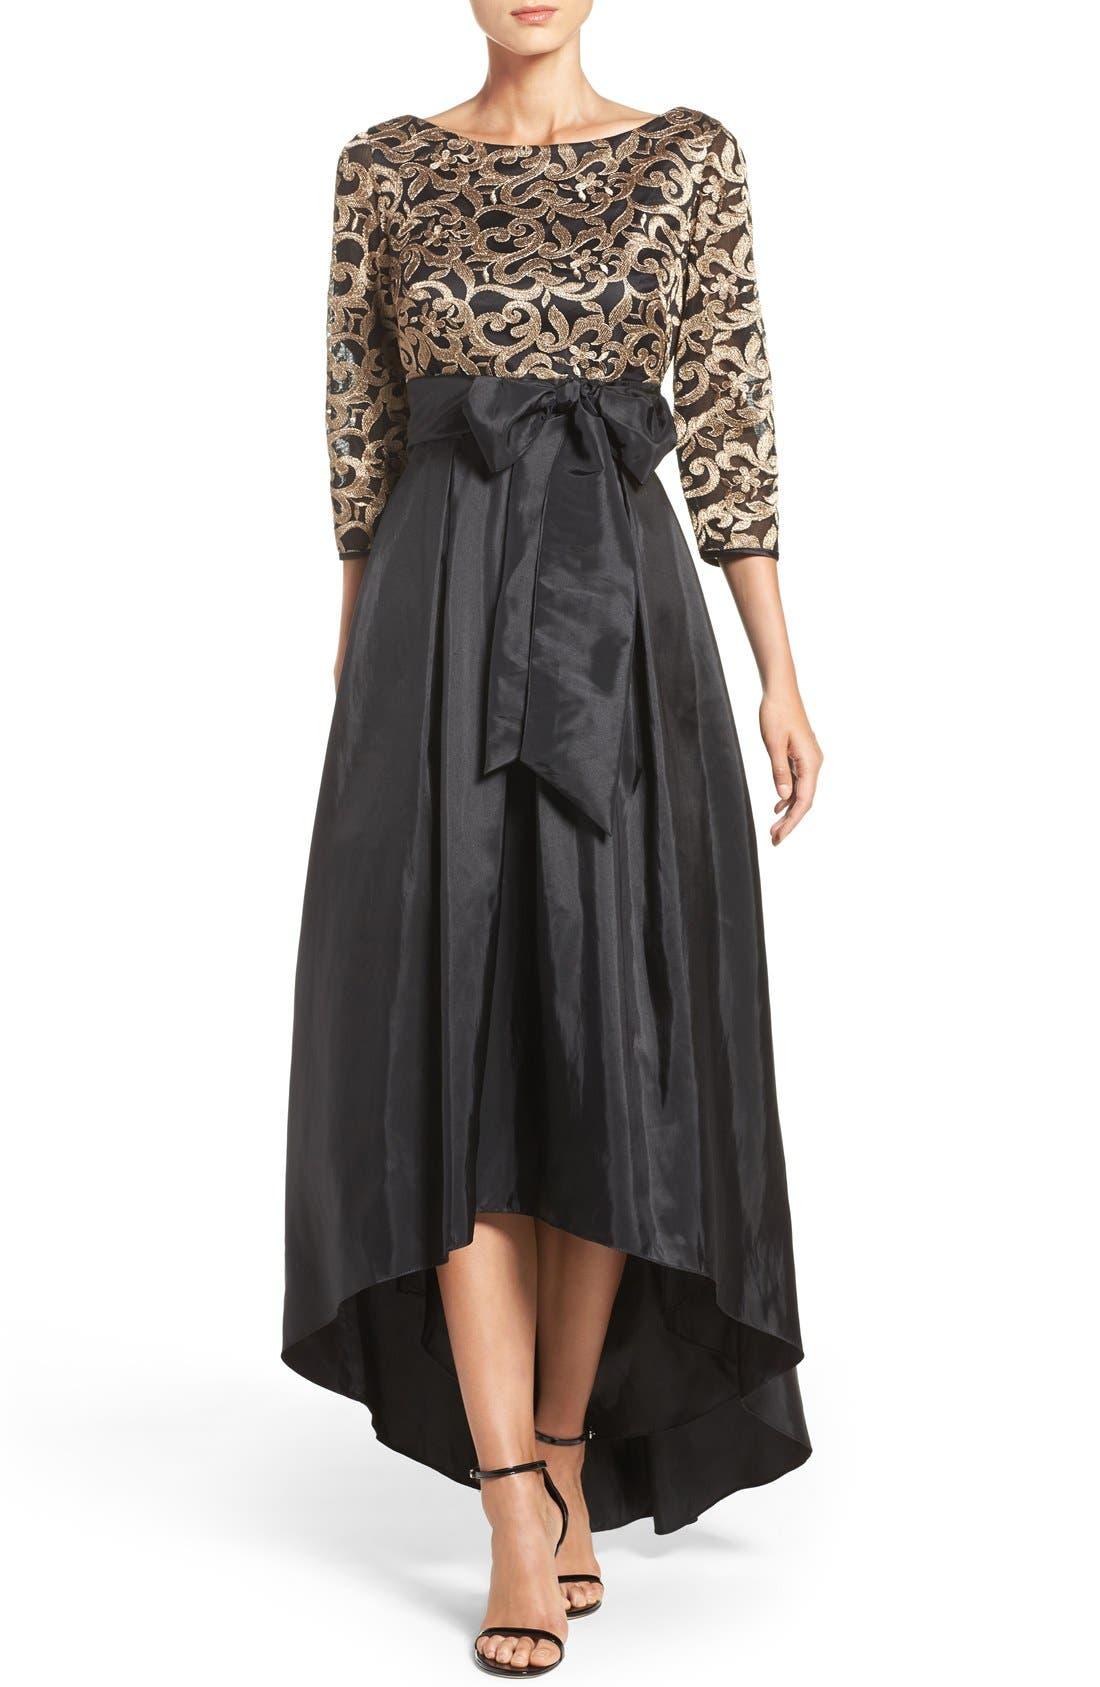 Alternate Image 1 Selected - Eliza J Embroidered Mesh & Taffeta Gown (Regular & Petite)